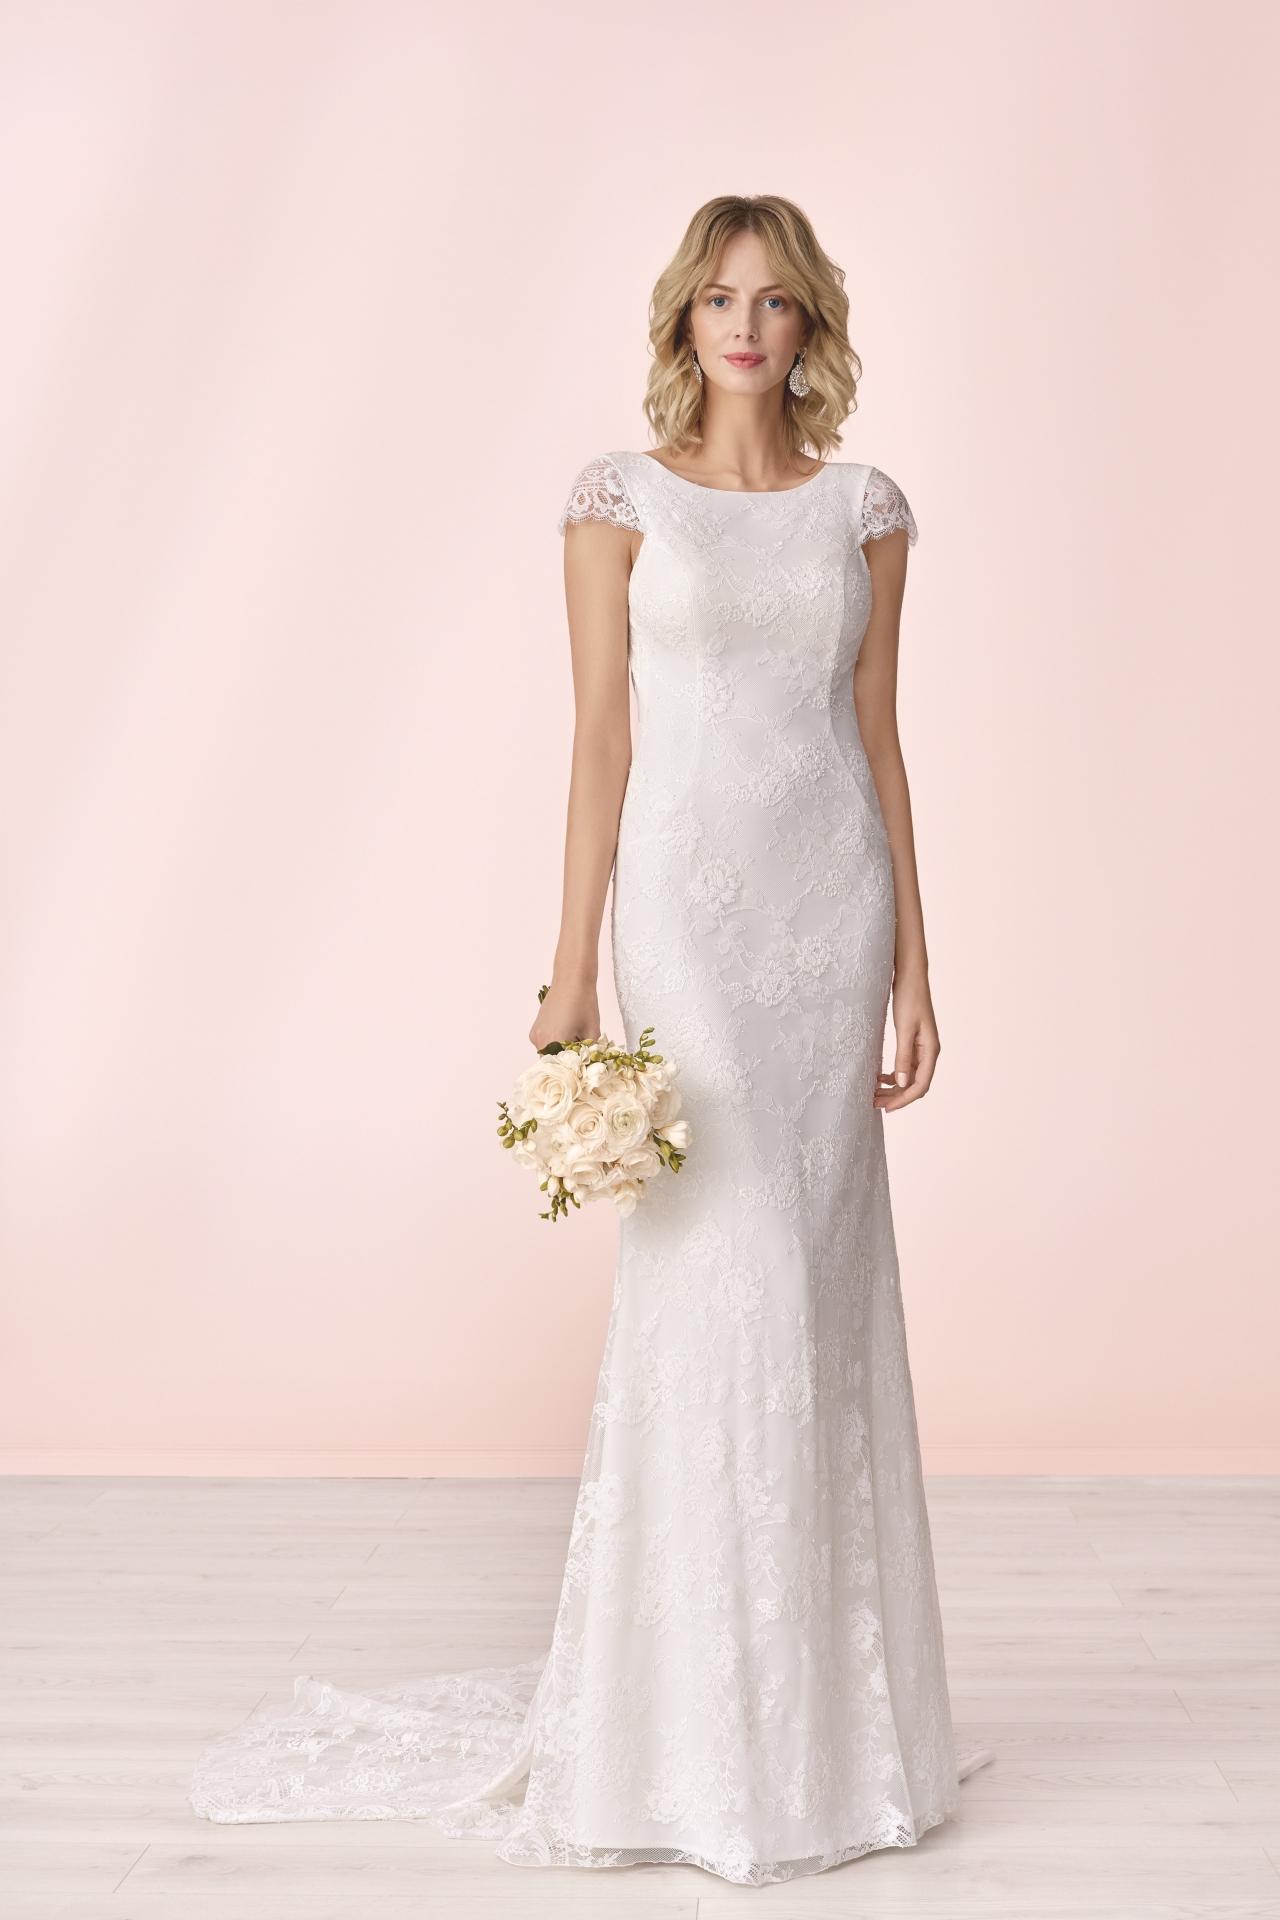 Brautkleid Elizabeth Konin 2019 - 4140T-1